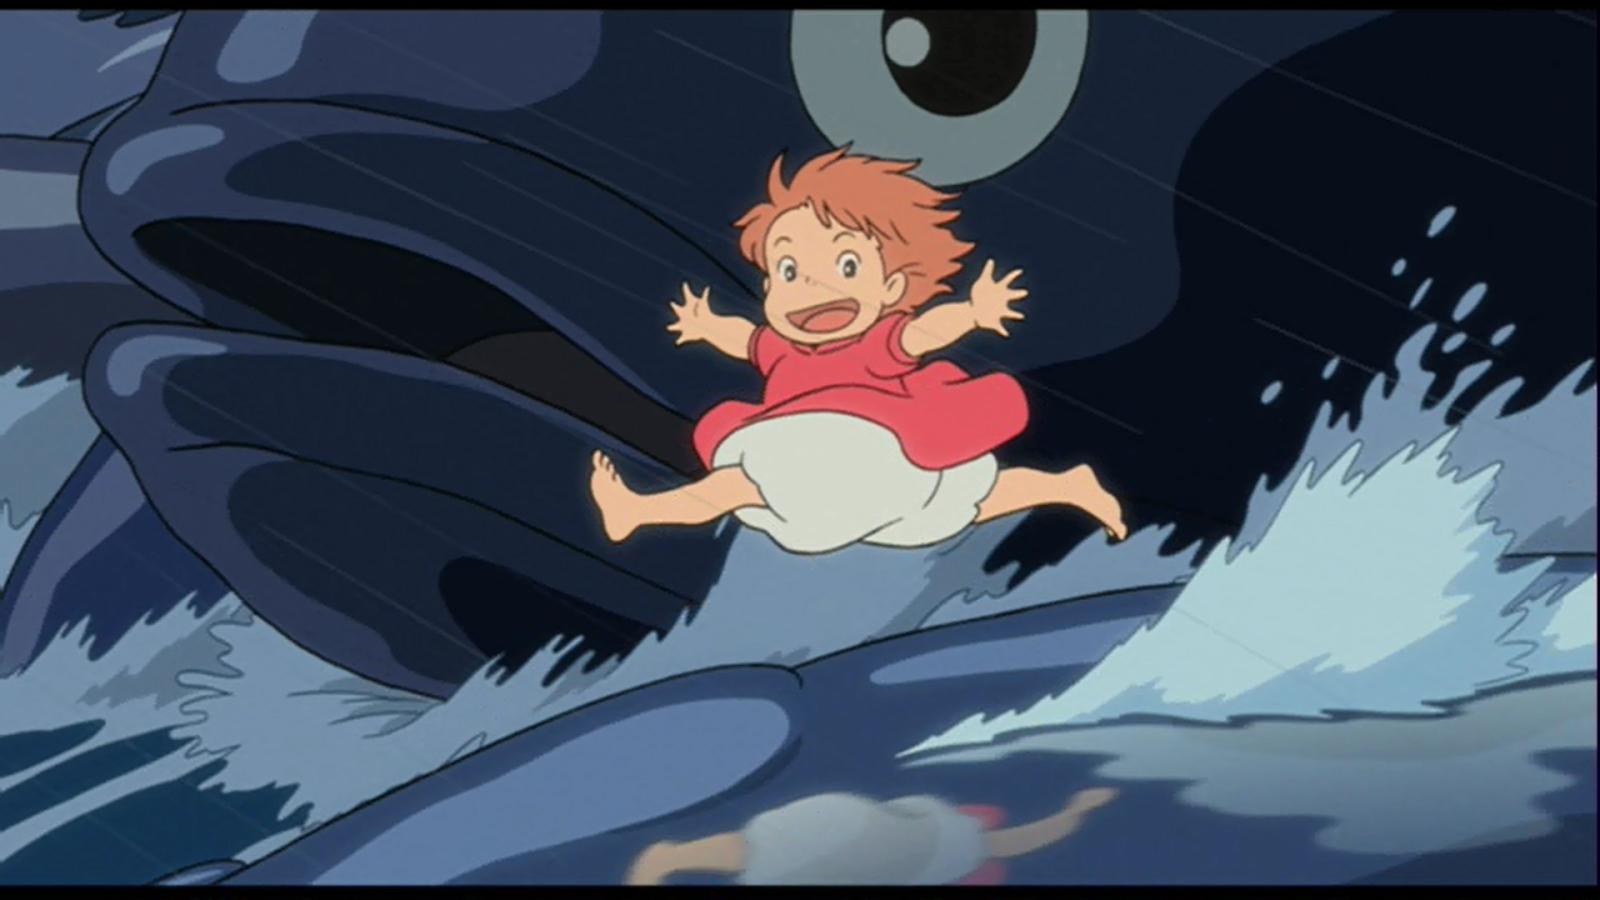 Ponyo (as a little girl)